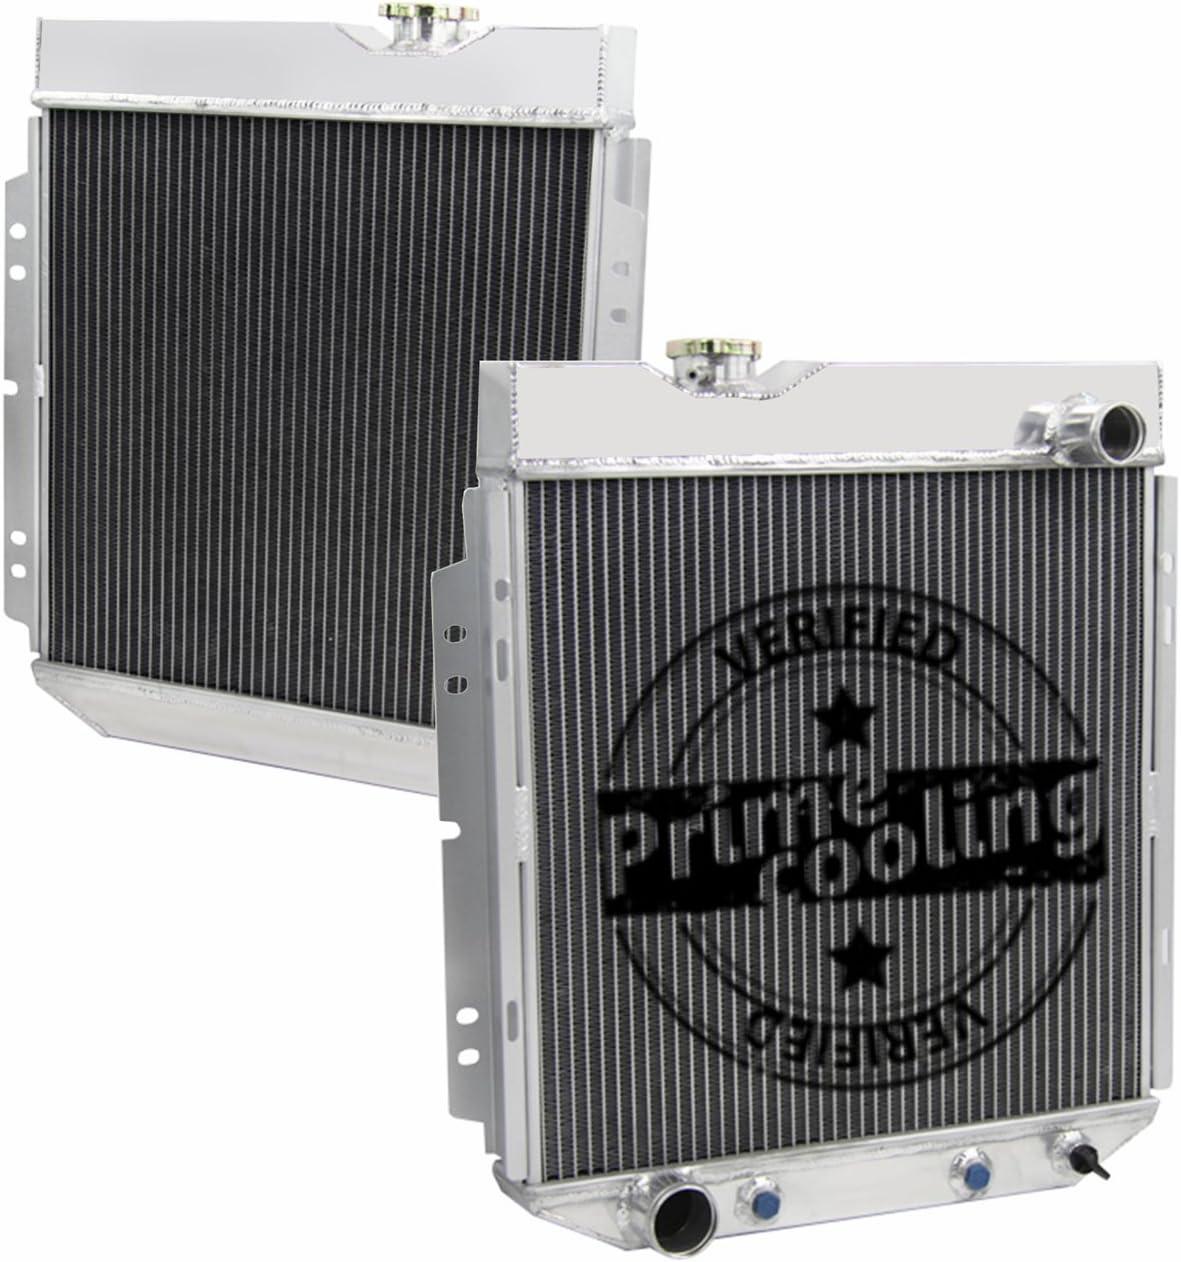 Primecooling 3 Row Aluminum Radiator for Falcon//Ranchero//Mustang//Comet V8 SWAP 1960-66